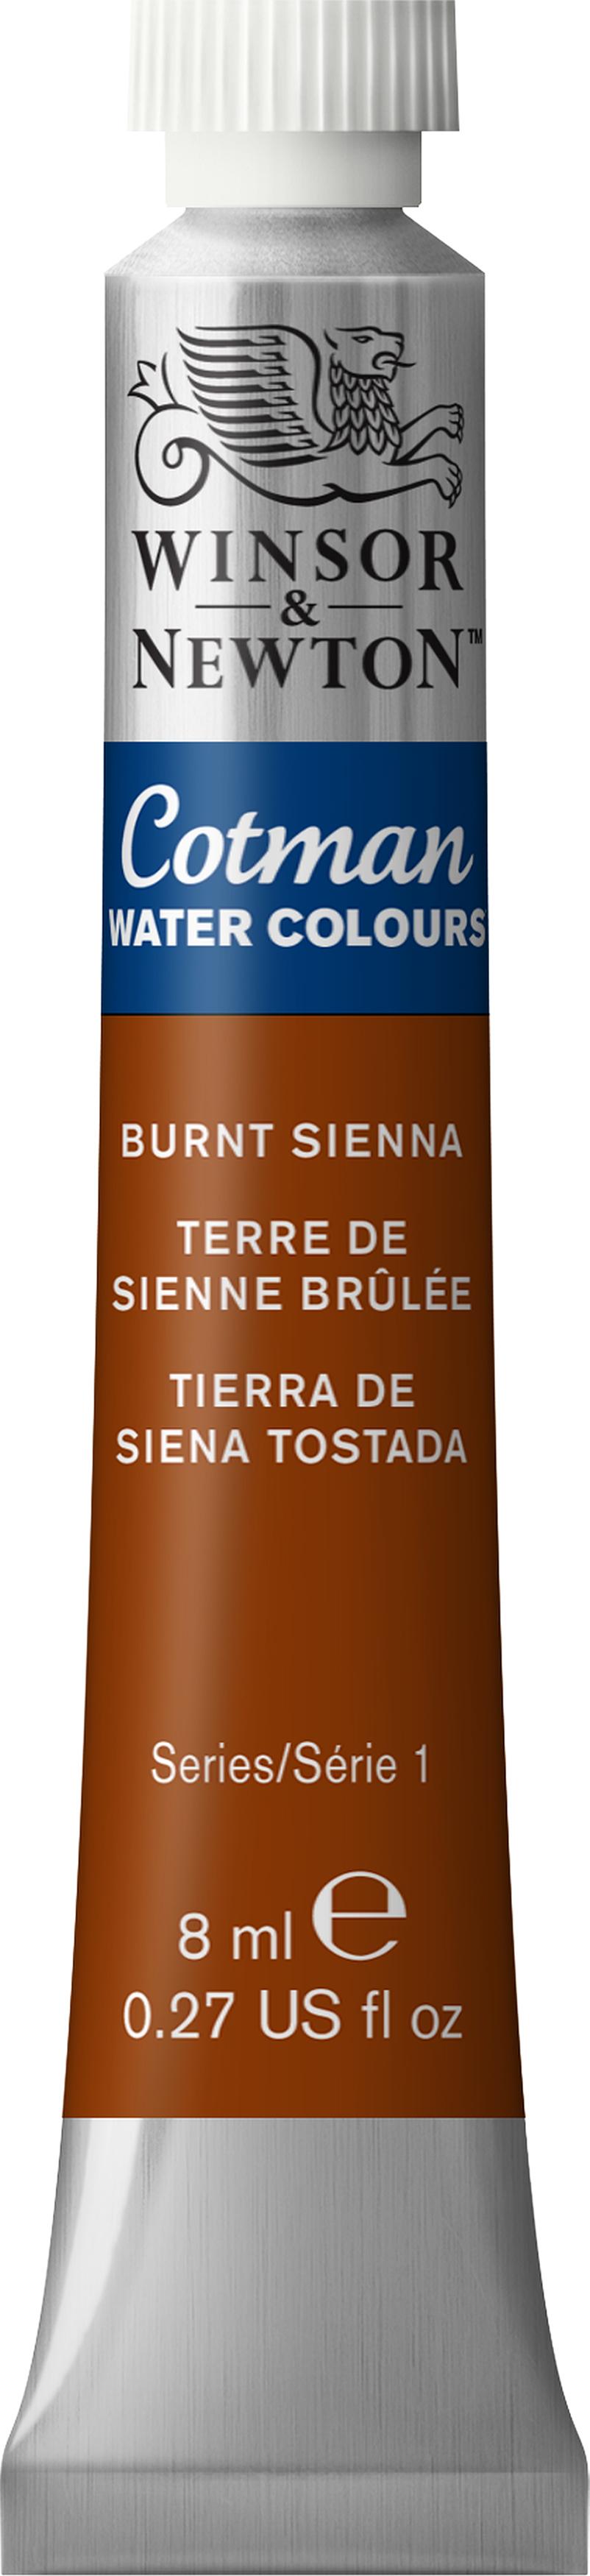 Winsor & Newton Cotman Water Colours 8ml-Burnt Sienna